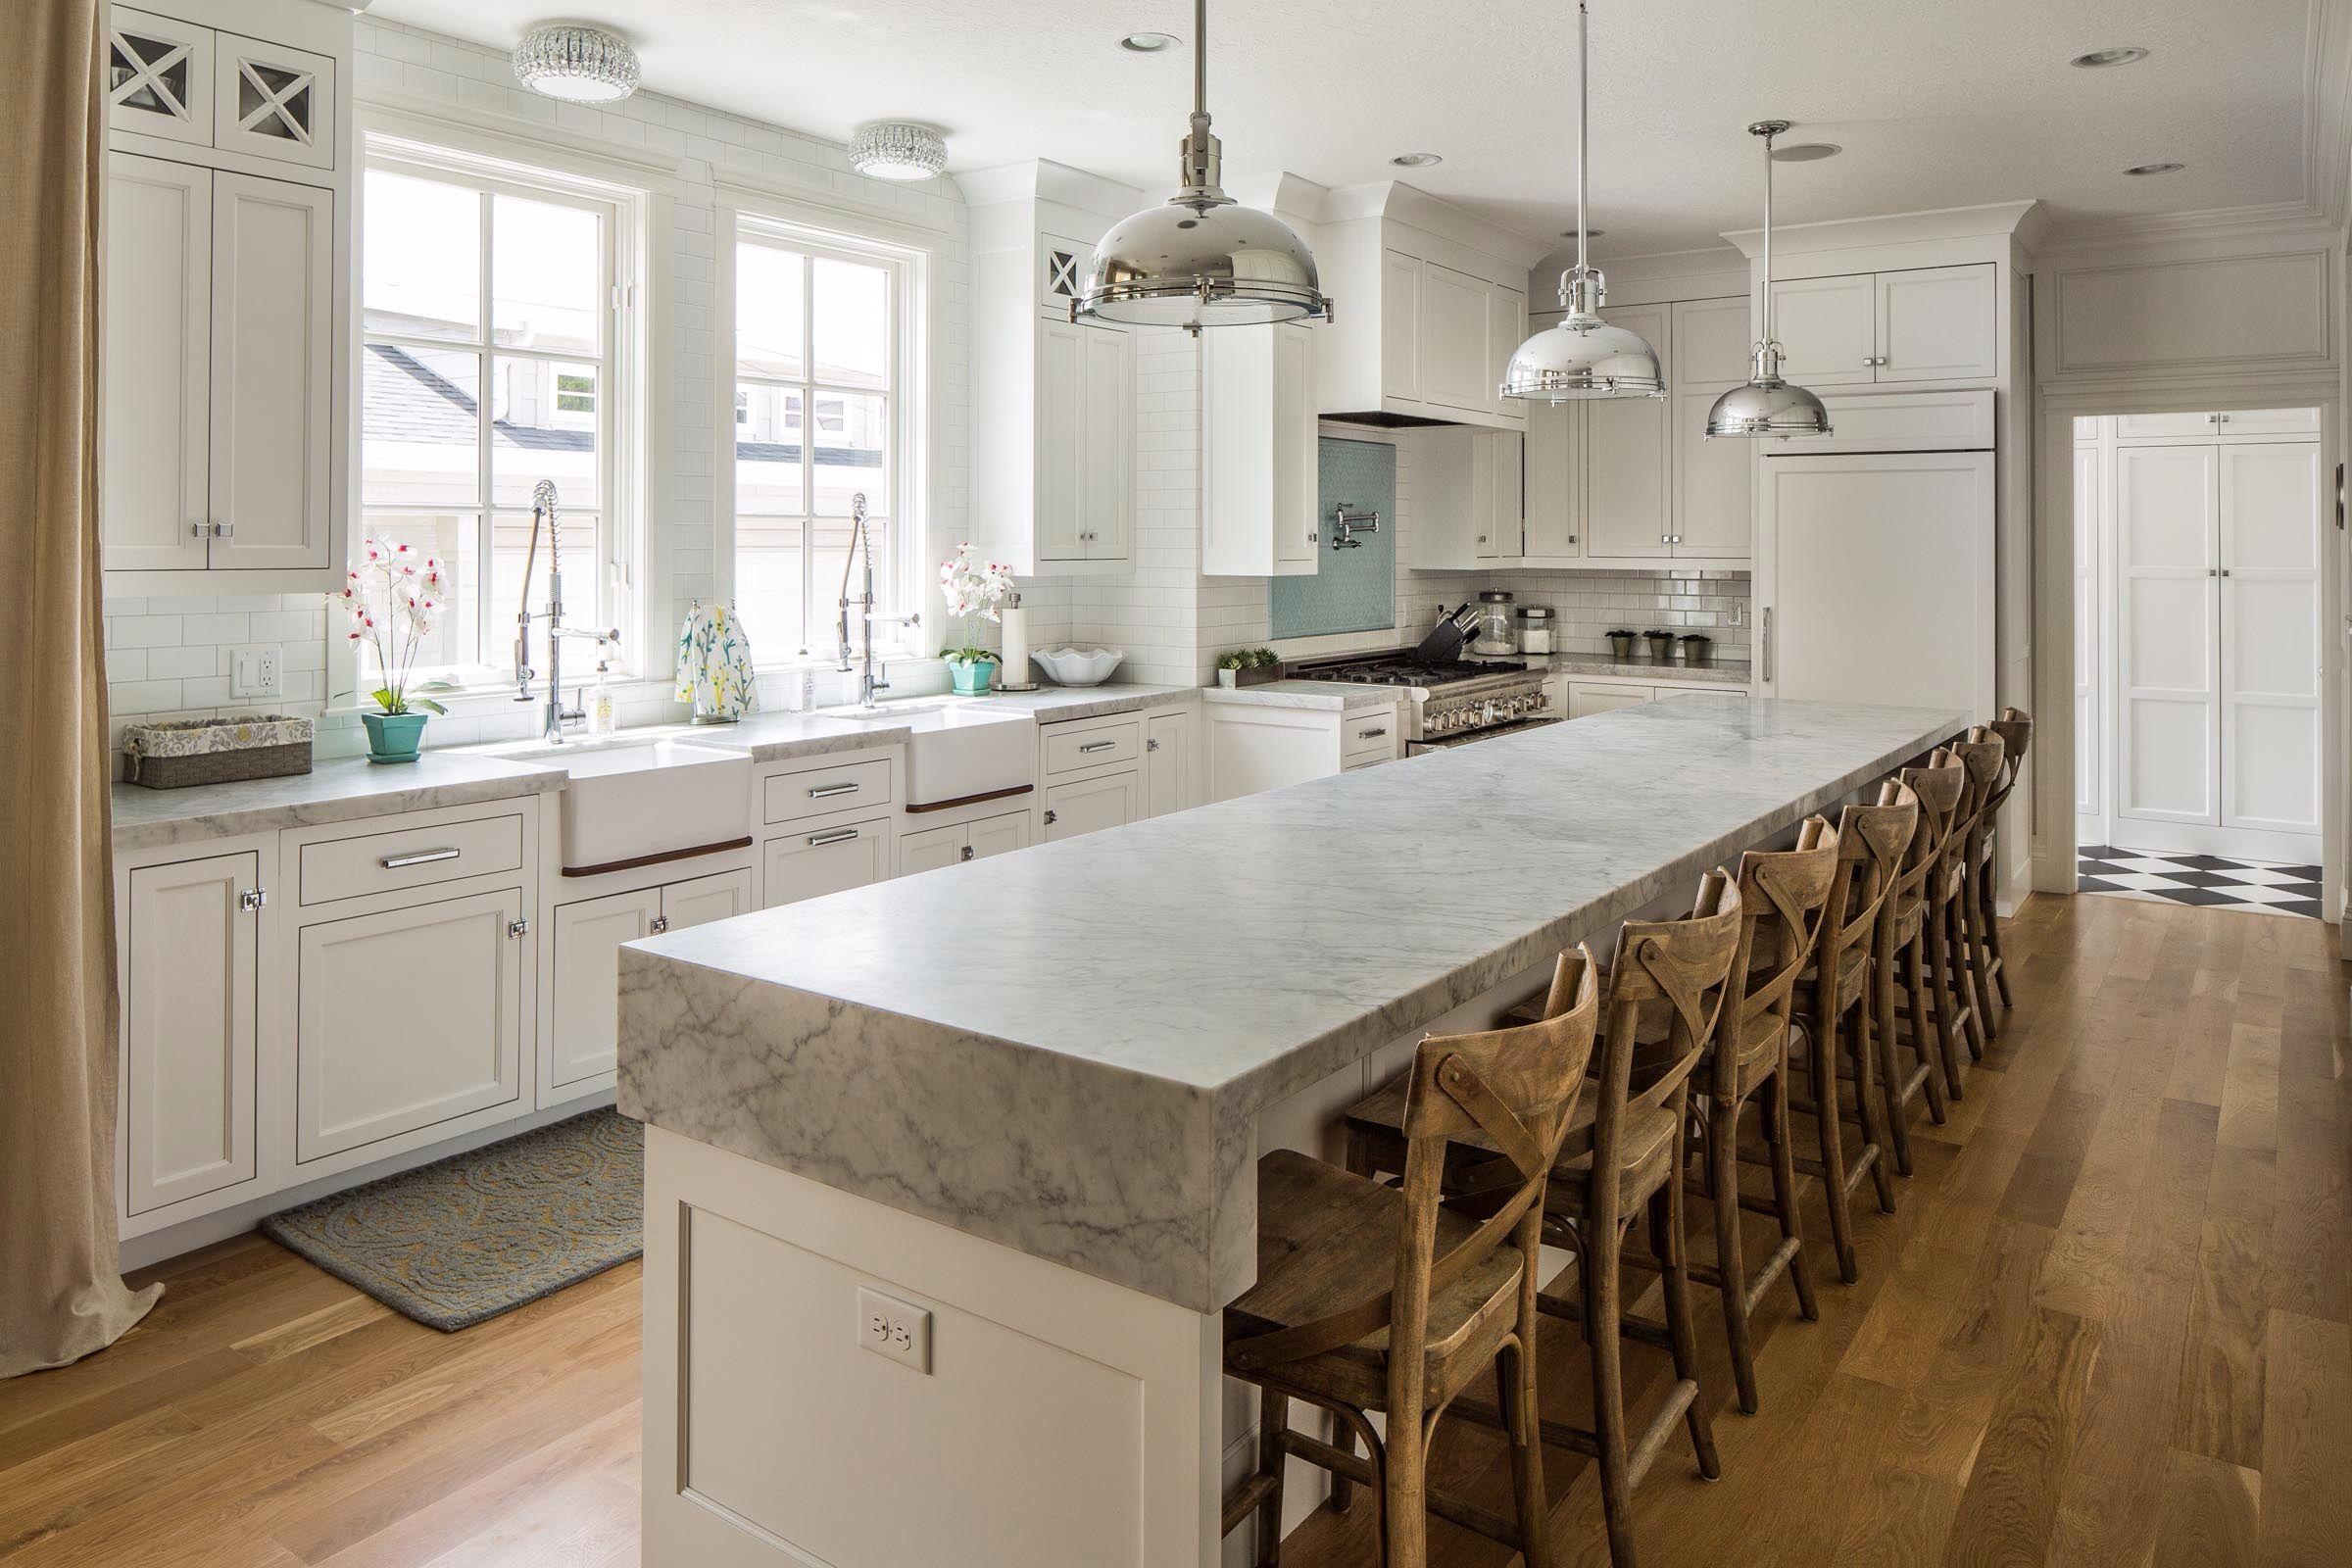 Inset White Cabinetry Benjamin Blackwelder Cabintery Kitchen